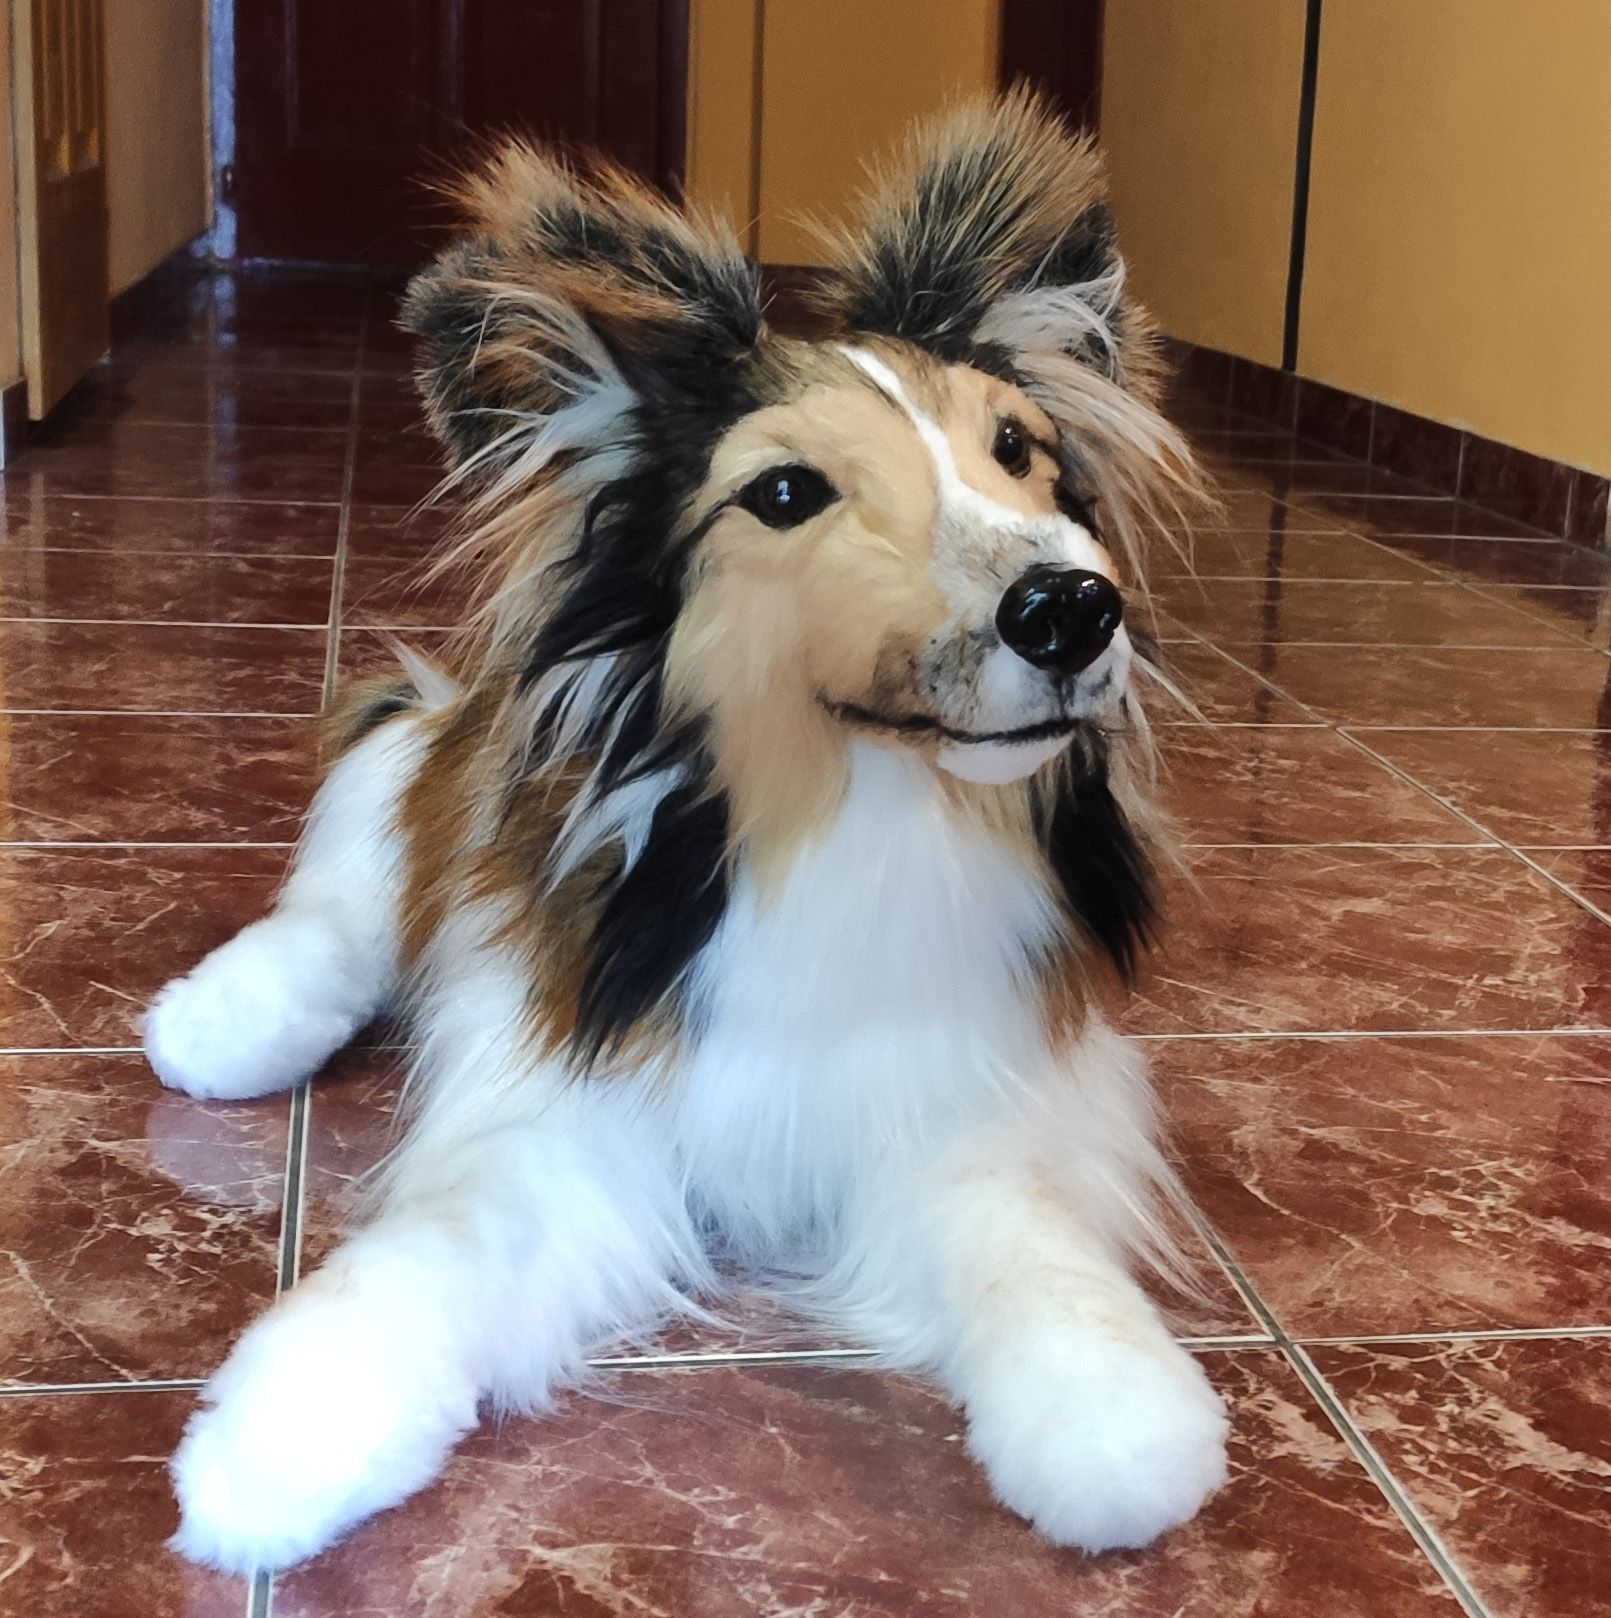 Life Size And Premium Faux Fur Realistic Lying Sheltie Plush Dog Shetland Sheepdog Puppy Toy Stuffed Animal Custom Pet Portrait Toy In 2020 Plush Dog Custom Pet Portraits Sheltie